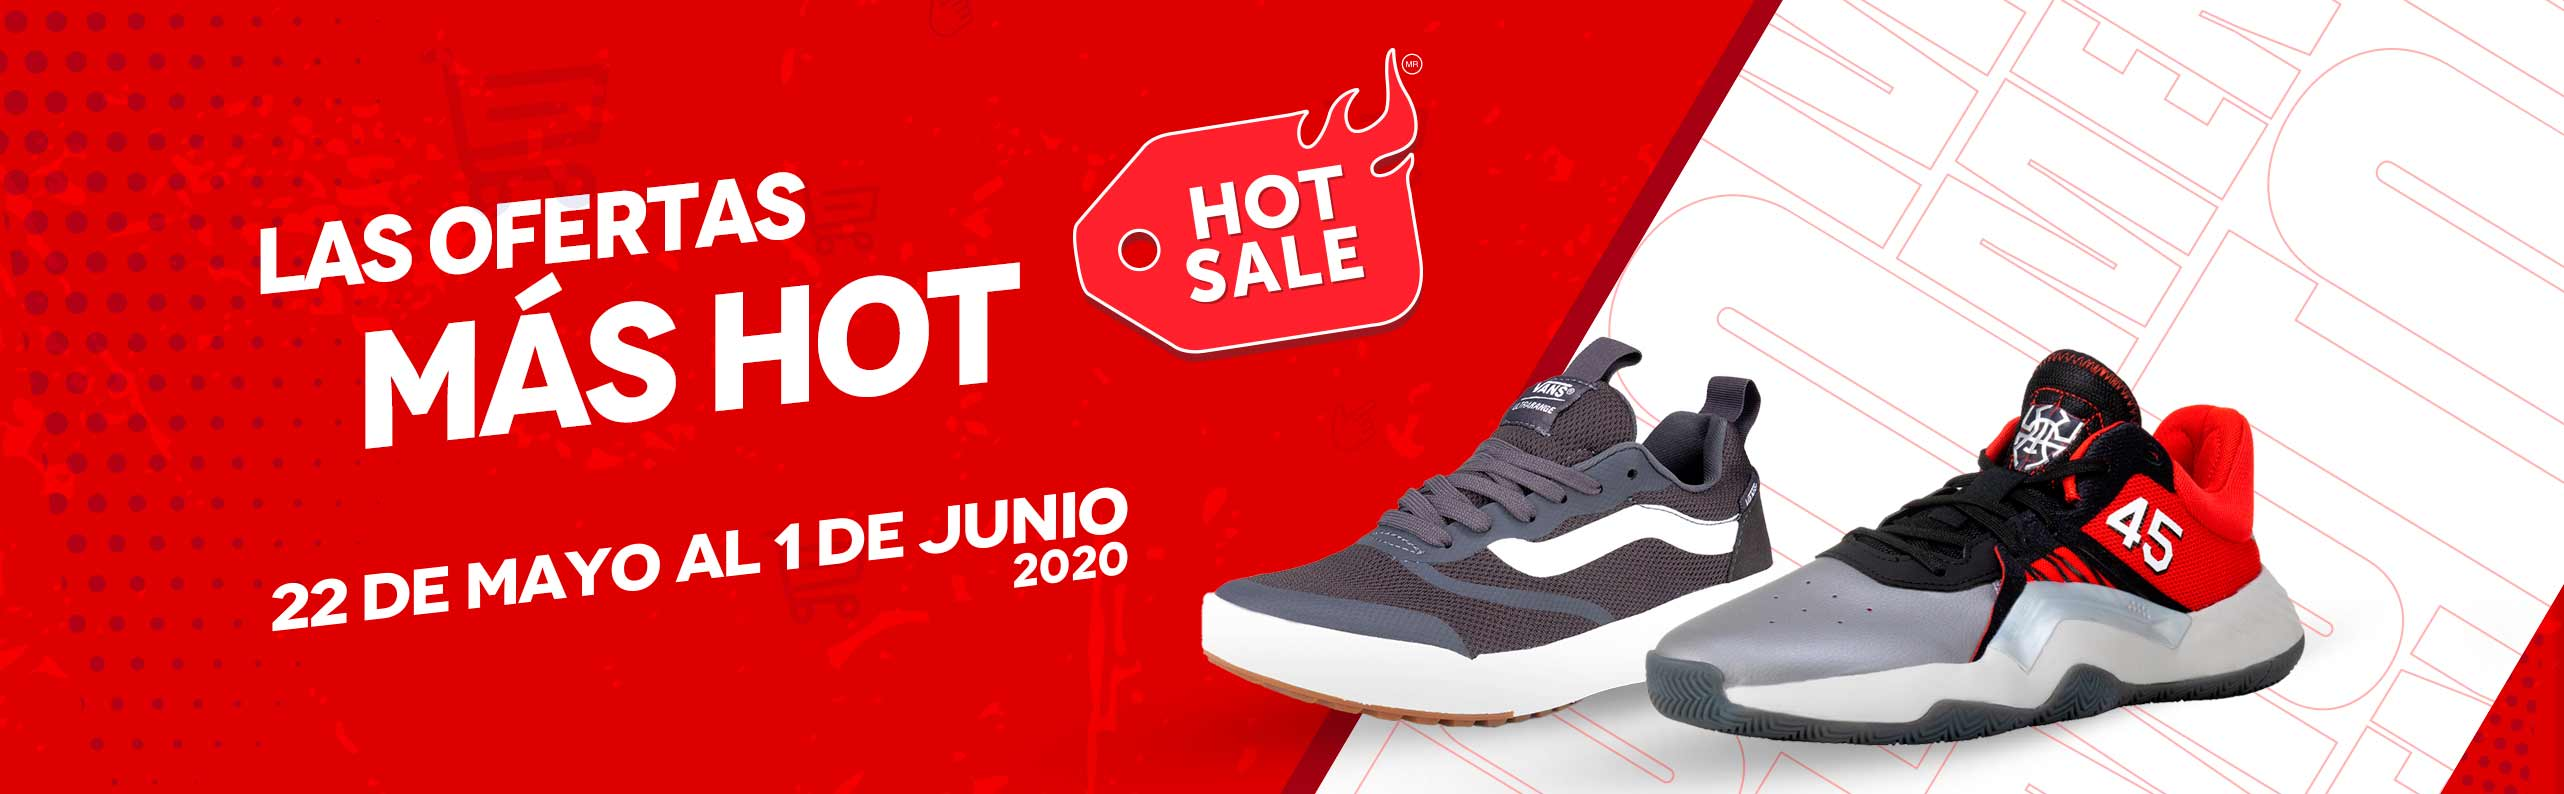 Hot Sale Ofertas Ropa Deportiva dportenis